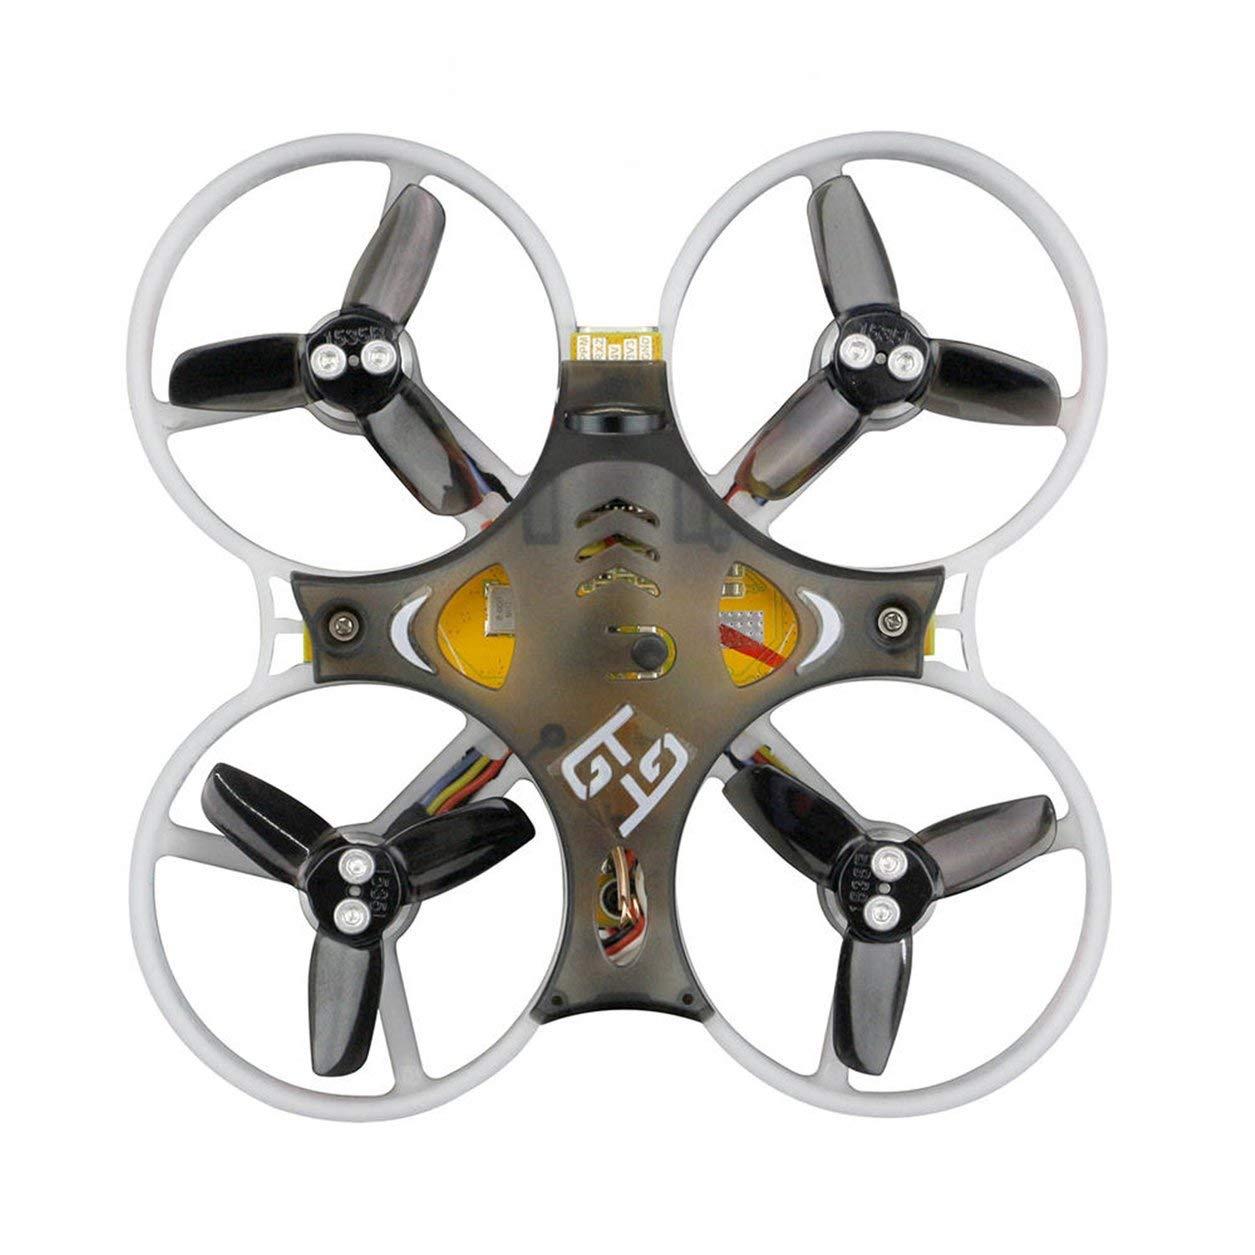 Dailyinshop LDARC Tiny GT7 75mm FPV Mini Brushless Racing Drone mit DSM2 Empfänger PNP